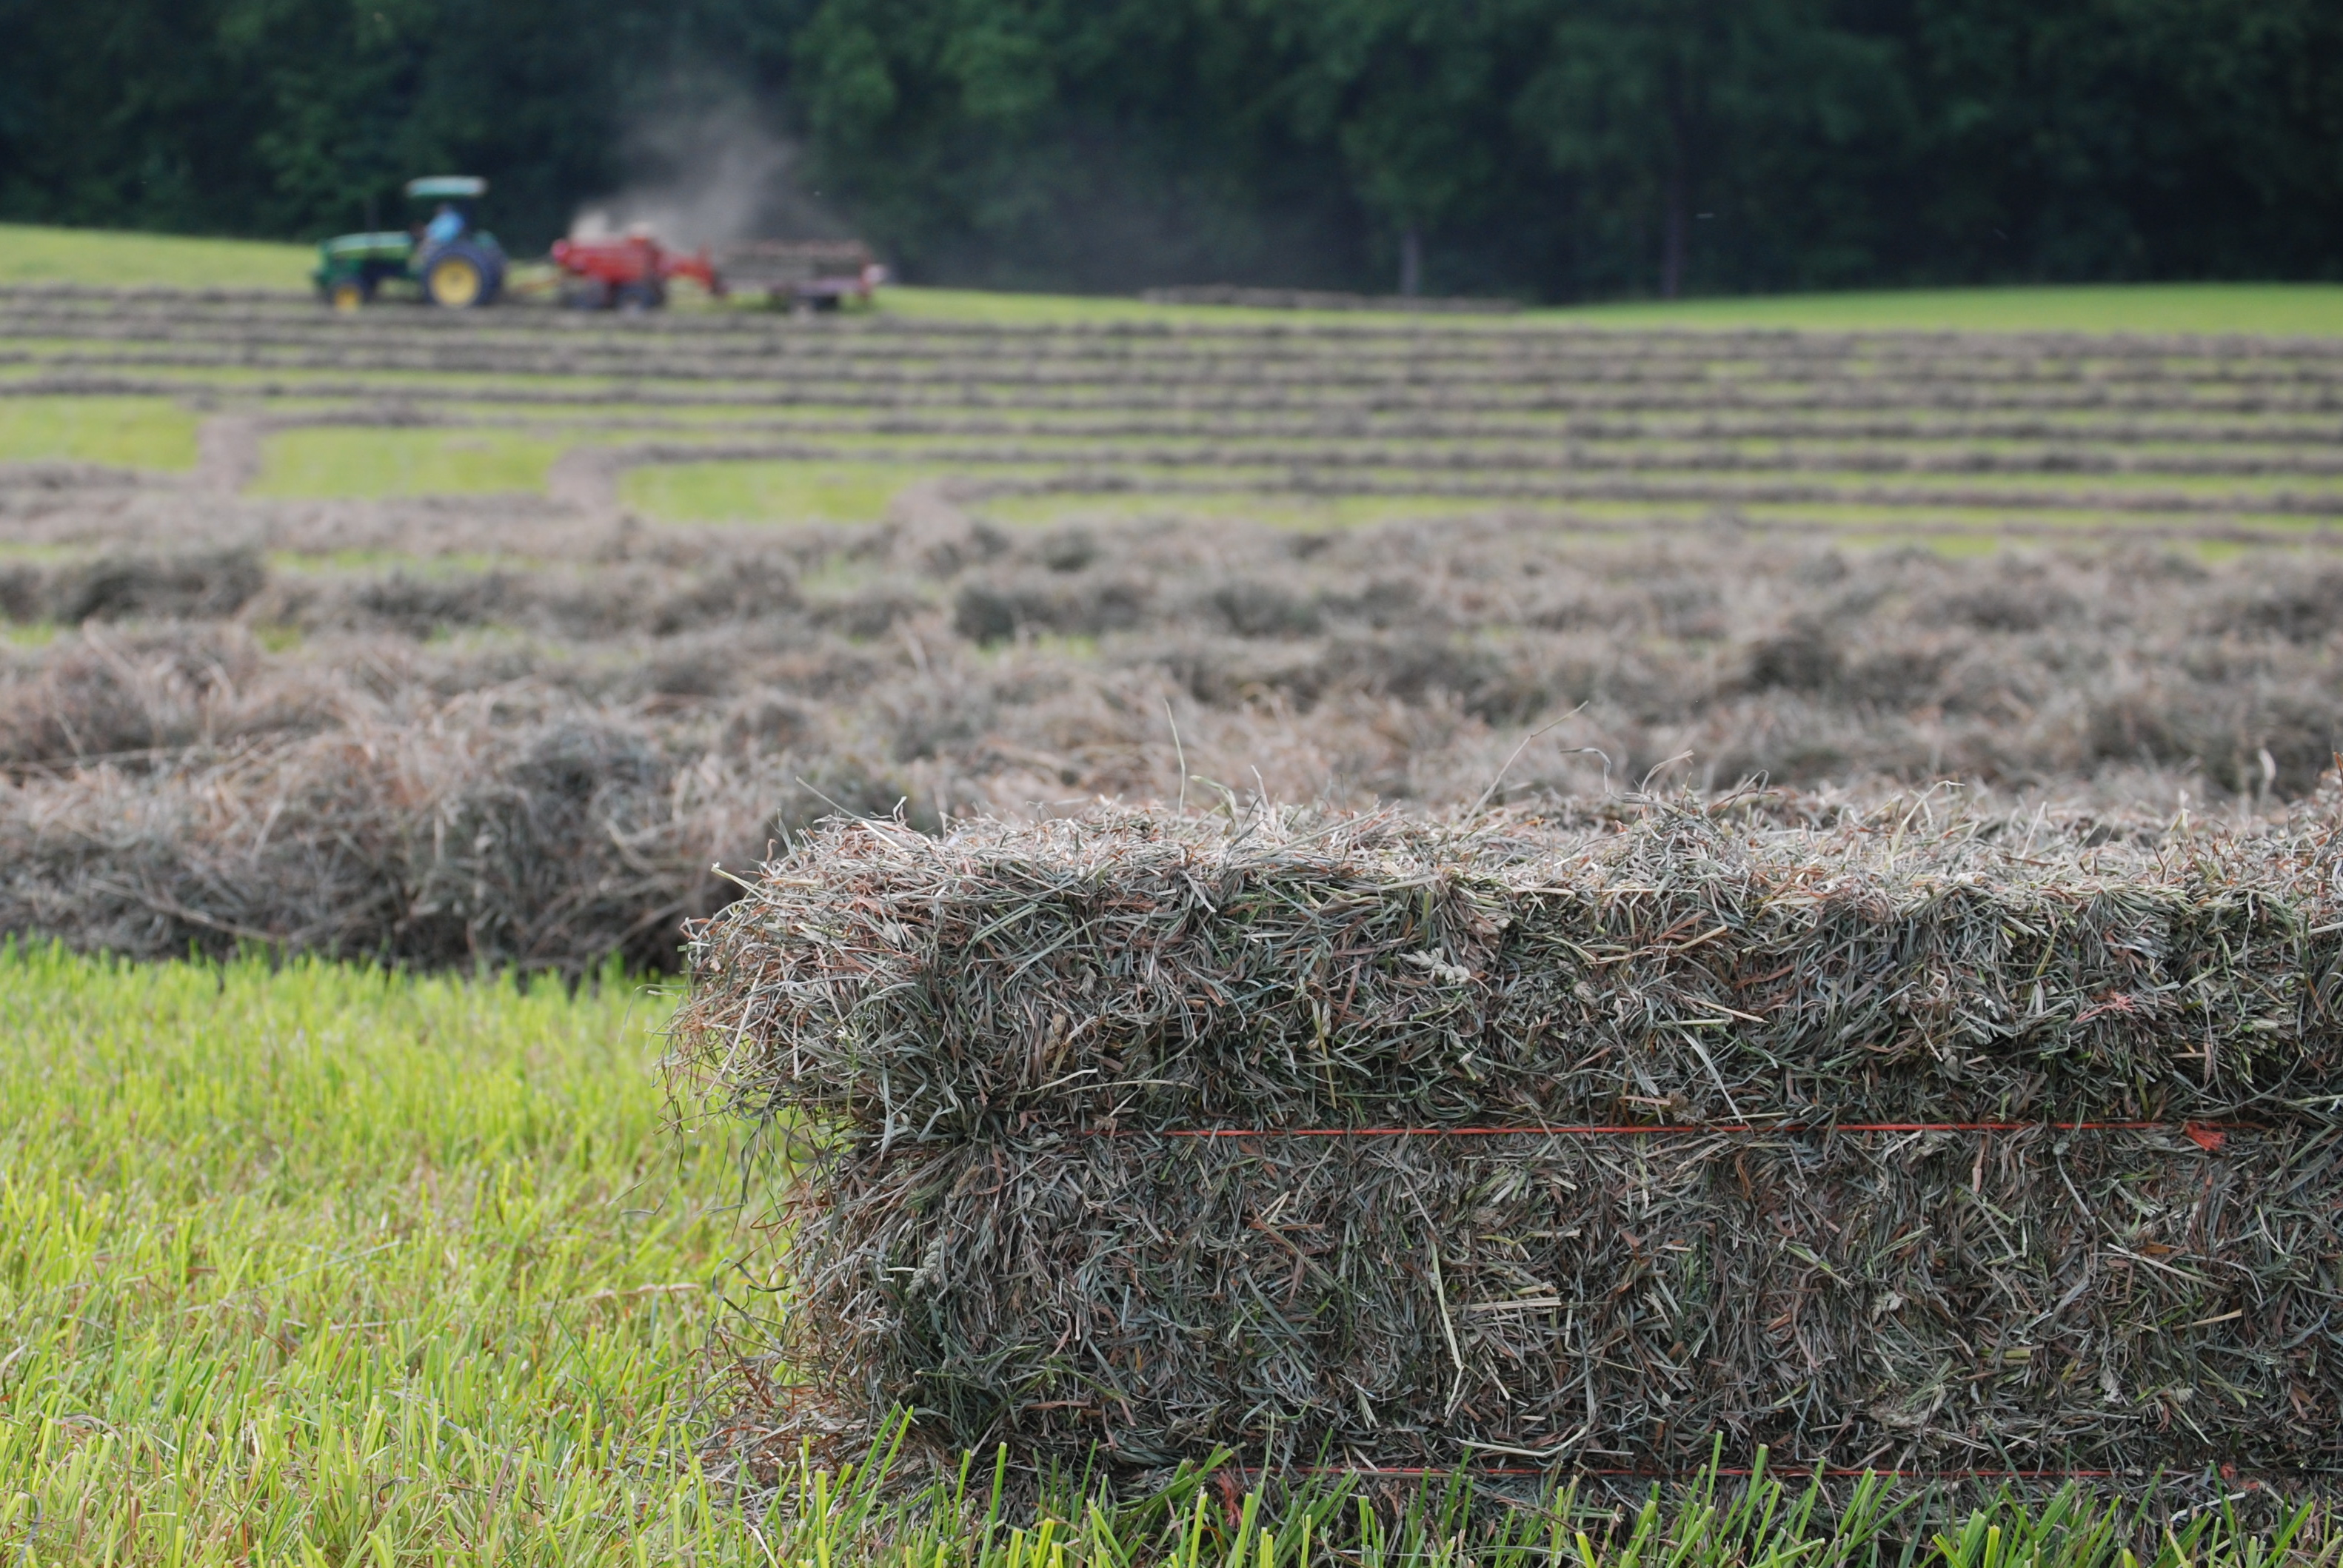 Image of hay bales